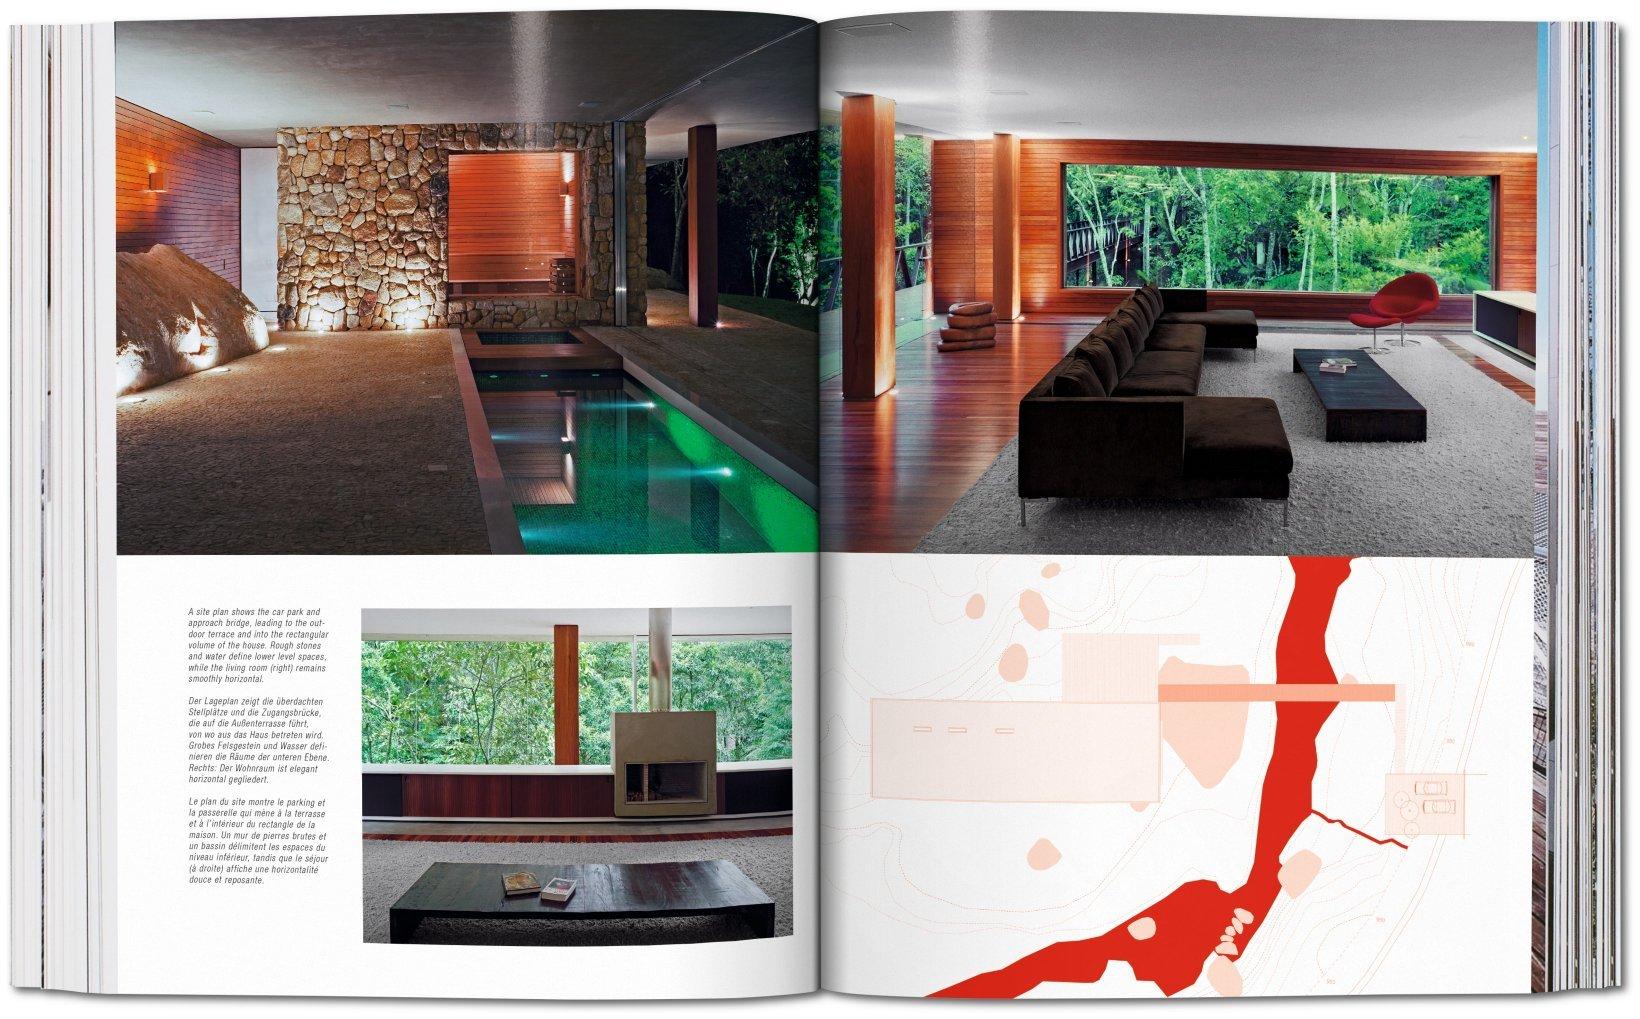 100 contemporary architects: philip jodidio: 9783836557207: amazon